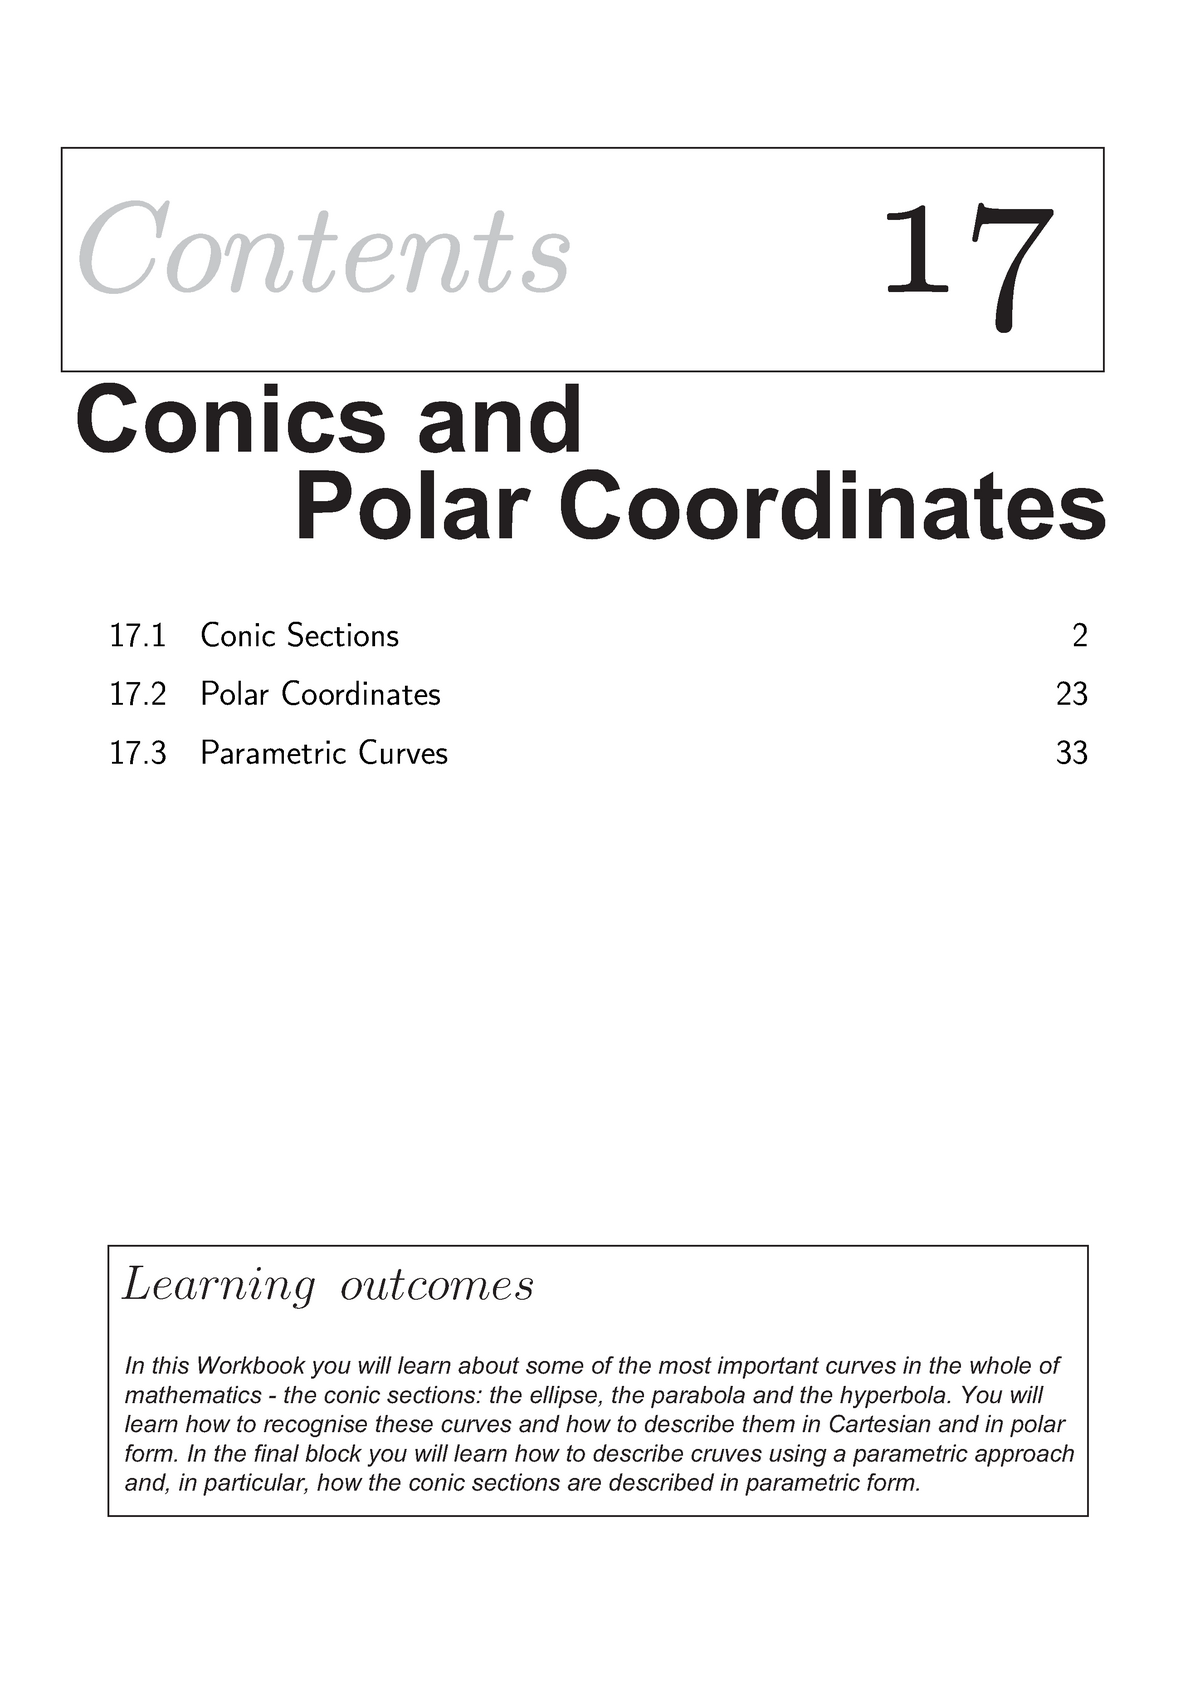 Conic Sections Worksheet - - Port - StuDocu